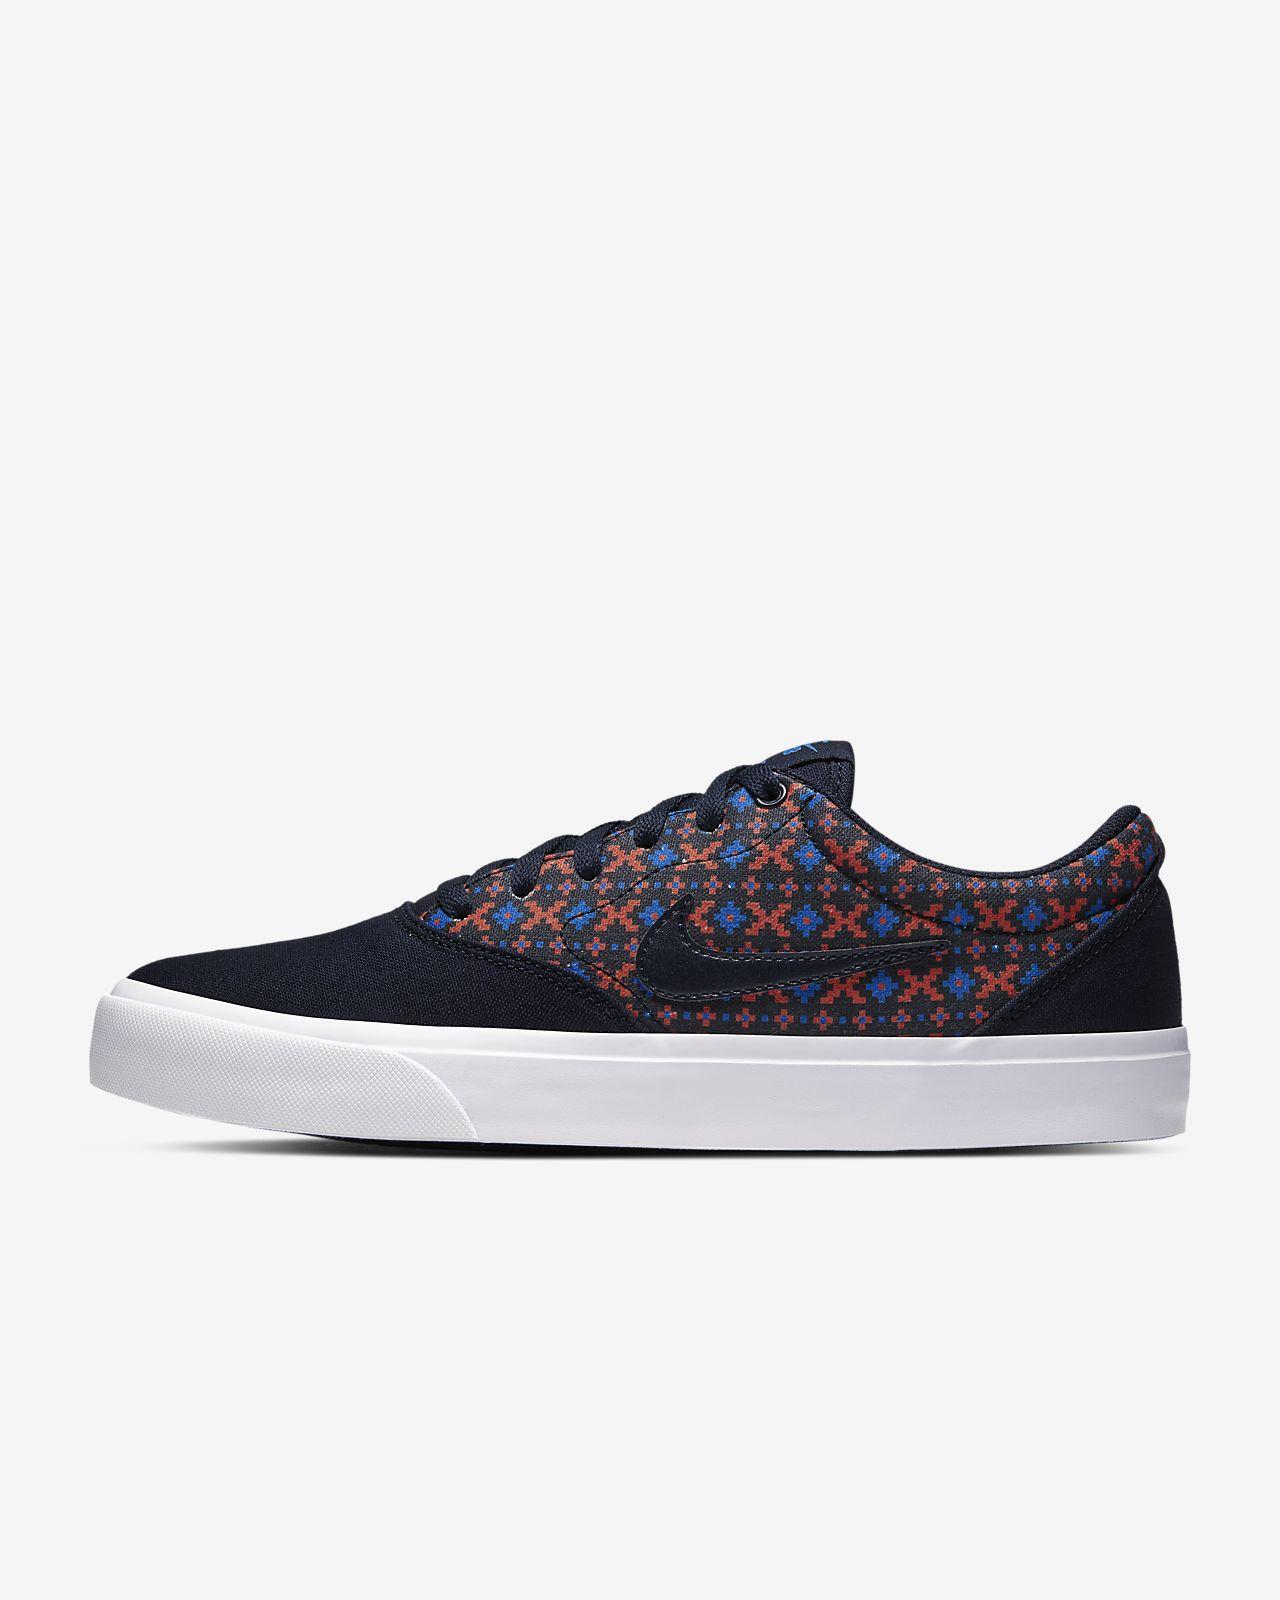 Skateboardová bota Nike SB Charge Premium